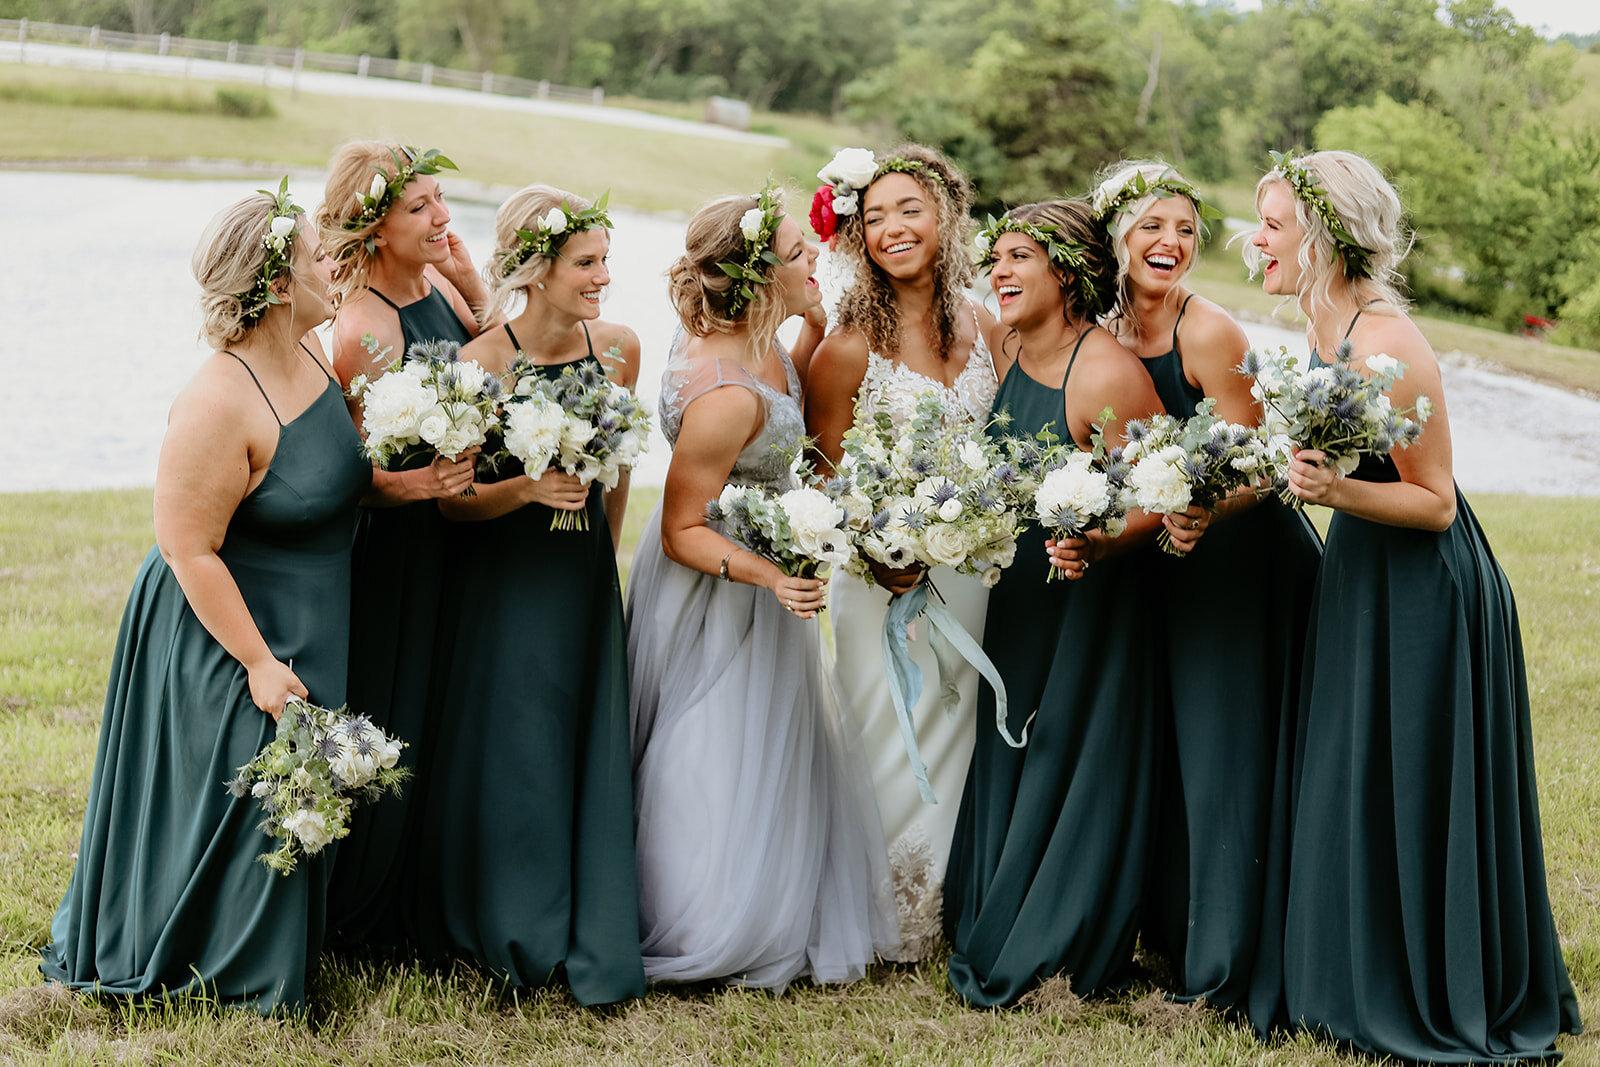 august-wolf-floral-design-des-moines-iowa-ames-wedding-florist-flowers-flower-crown-bridesmaids-evergreen-dresses-boho-lace-long-ribbon.jpg